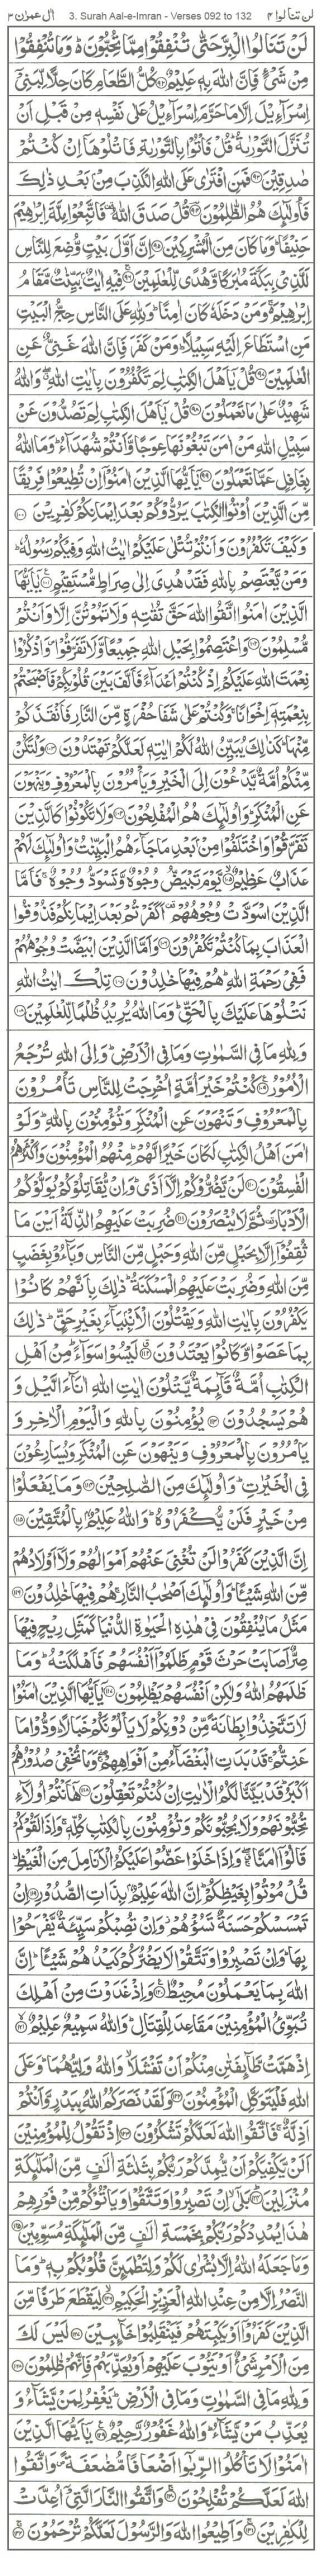 Para 4 Surah Aal-e-Imran - Verses 092 to 132